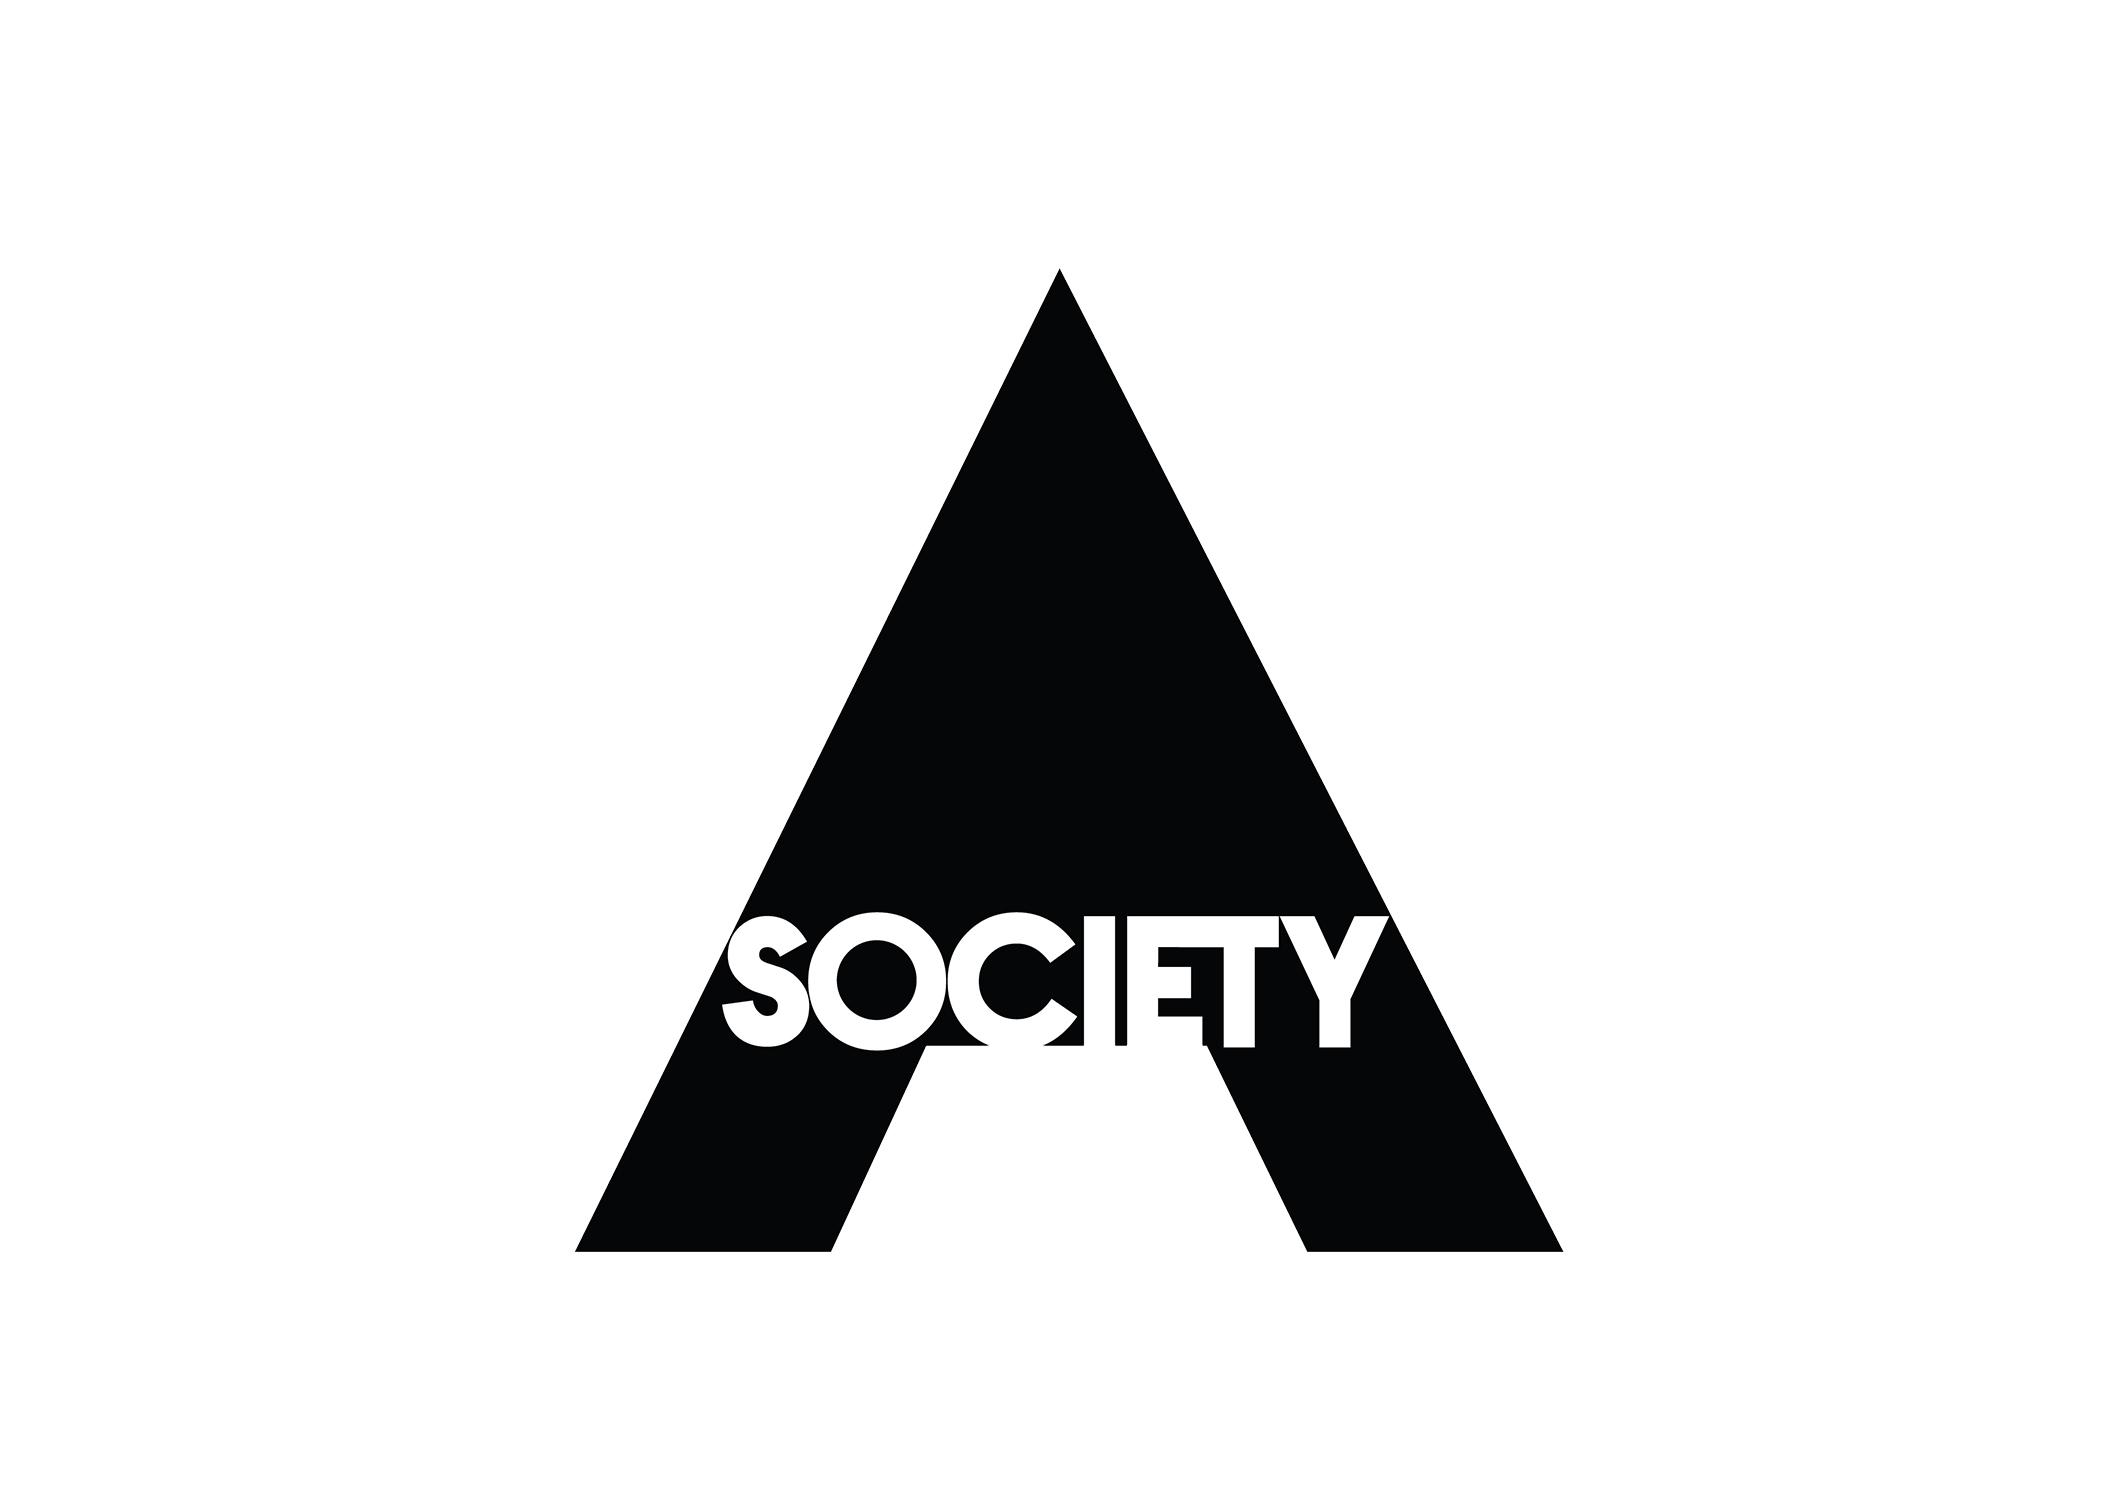 SocietyA